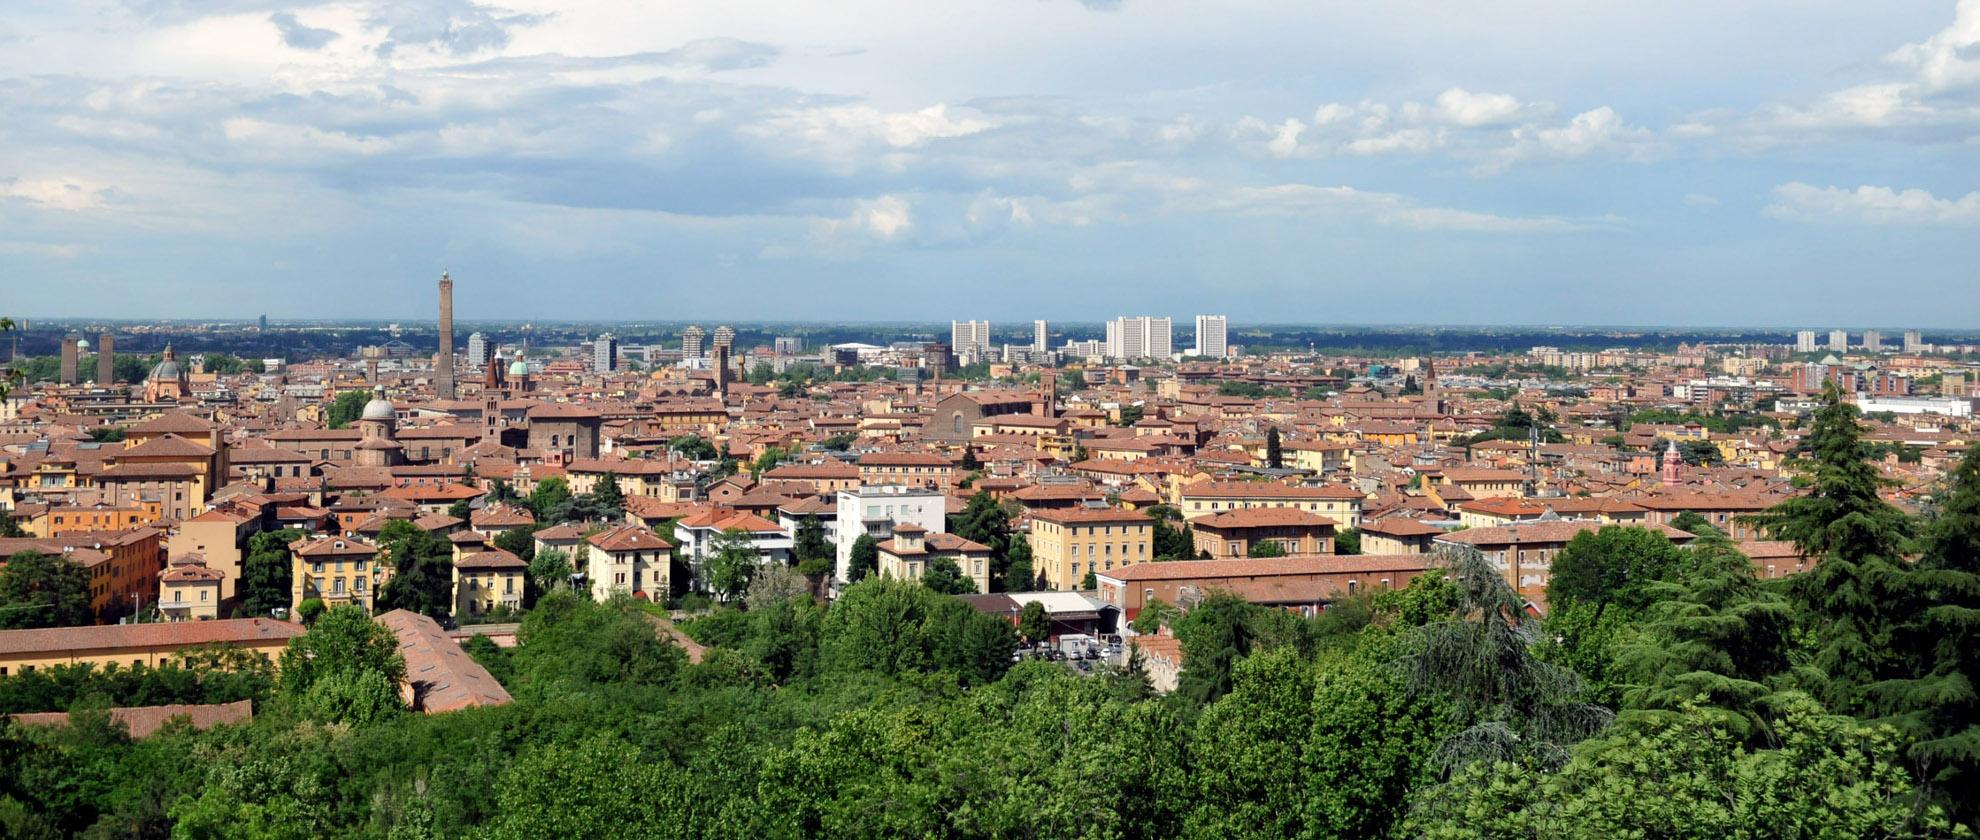 Panoramica di Bologna